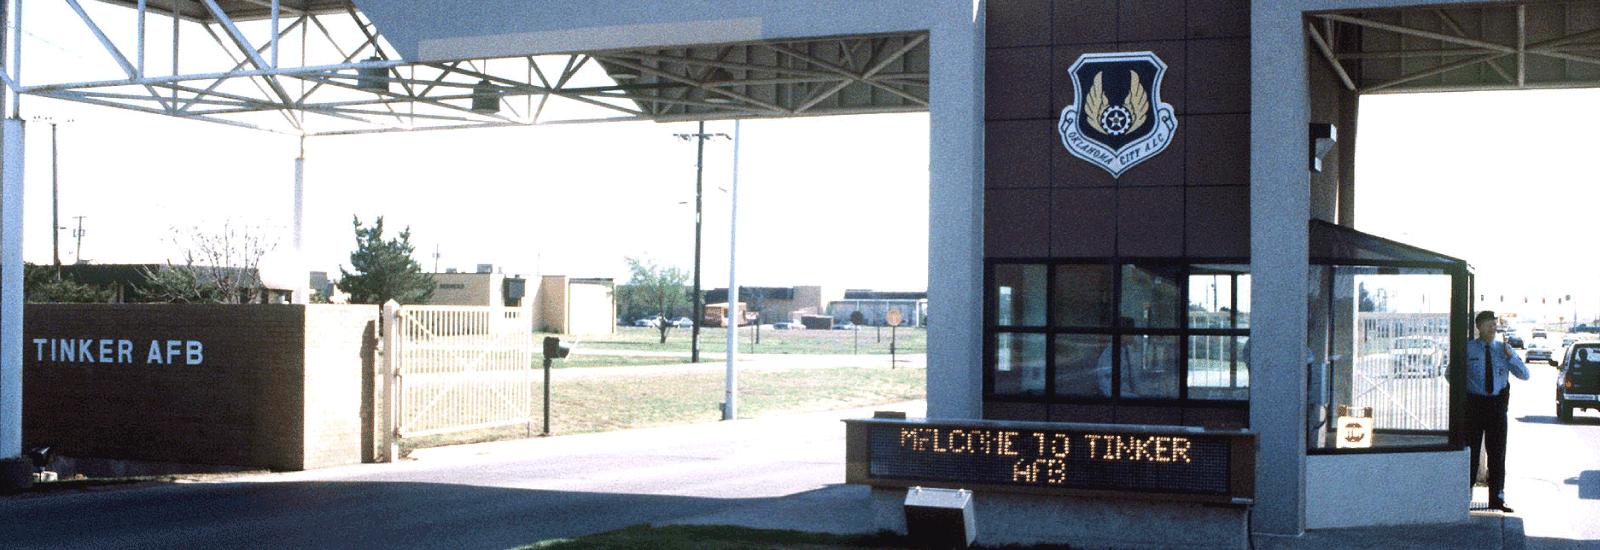 Tinker AFB Gate Hours